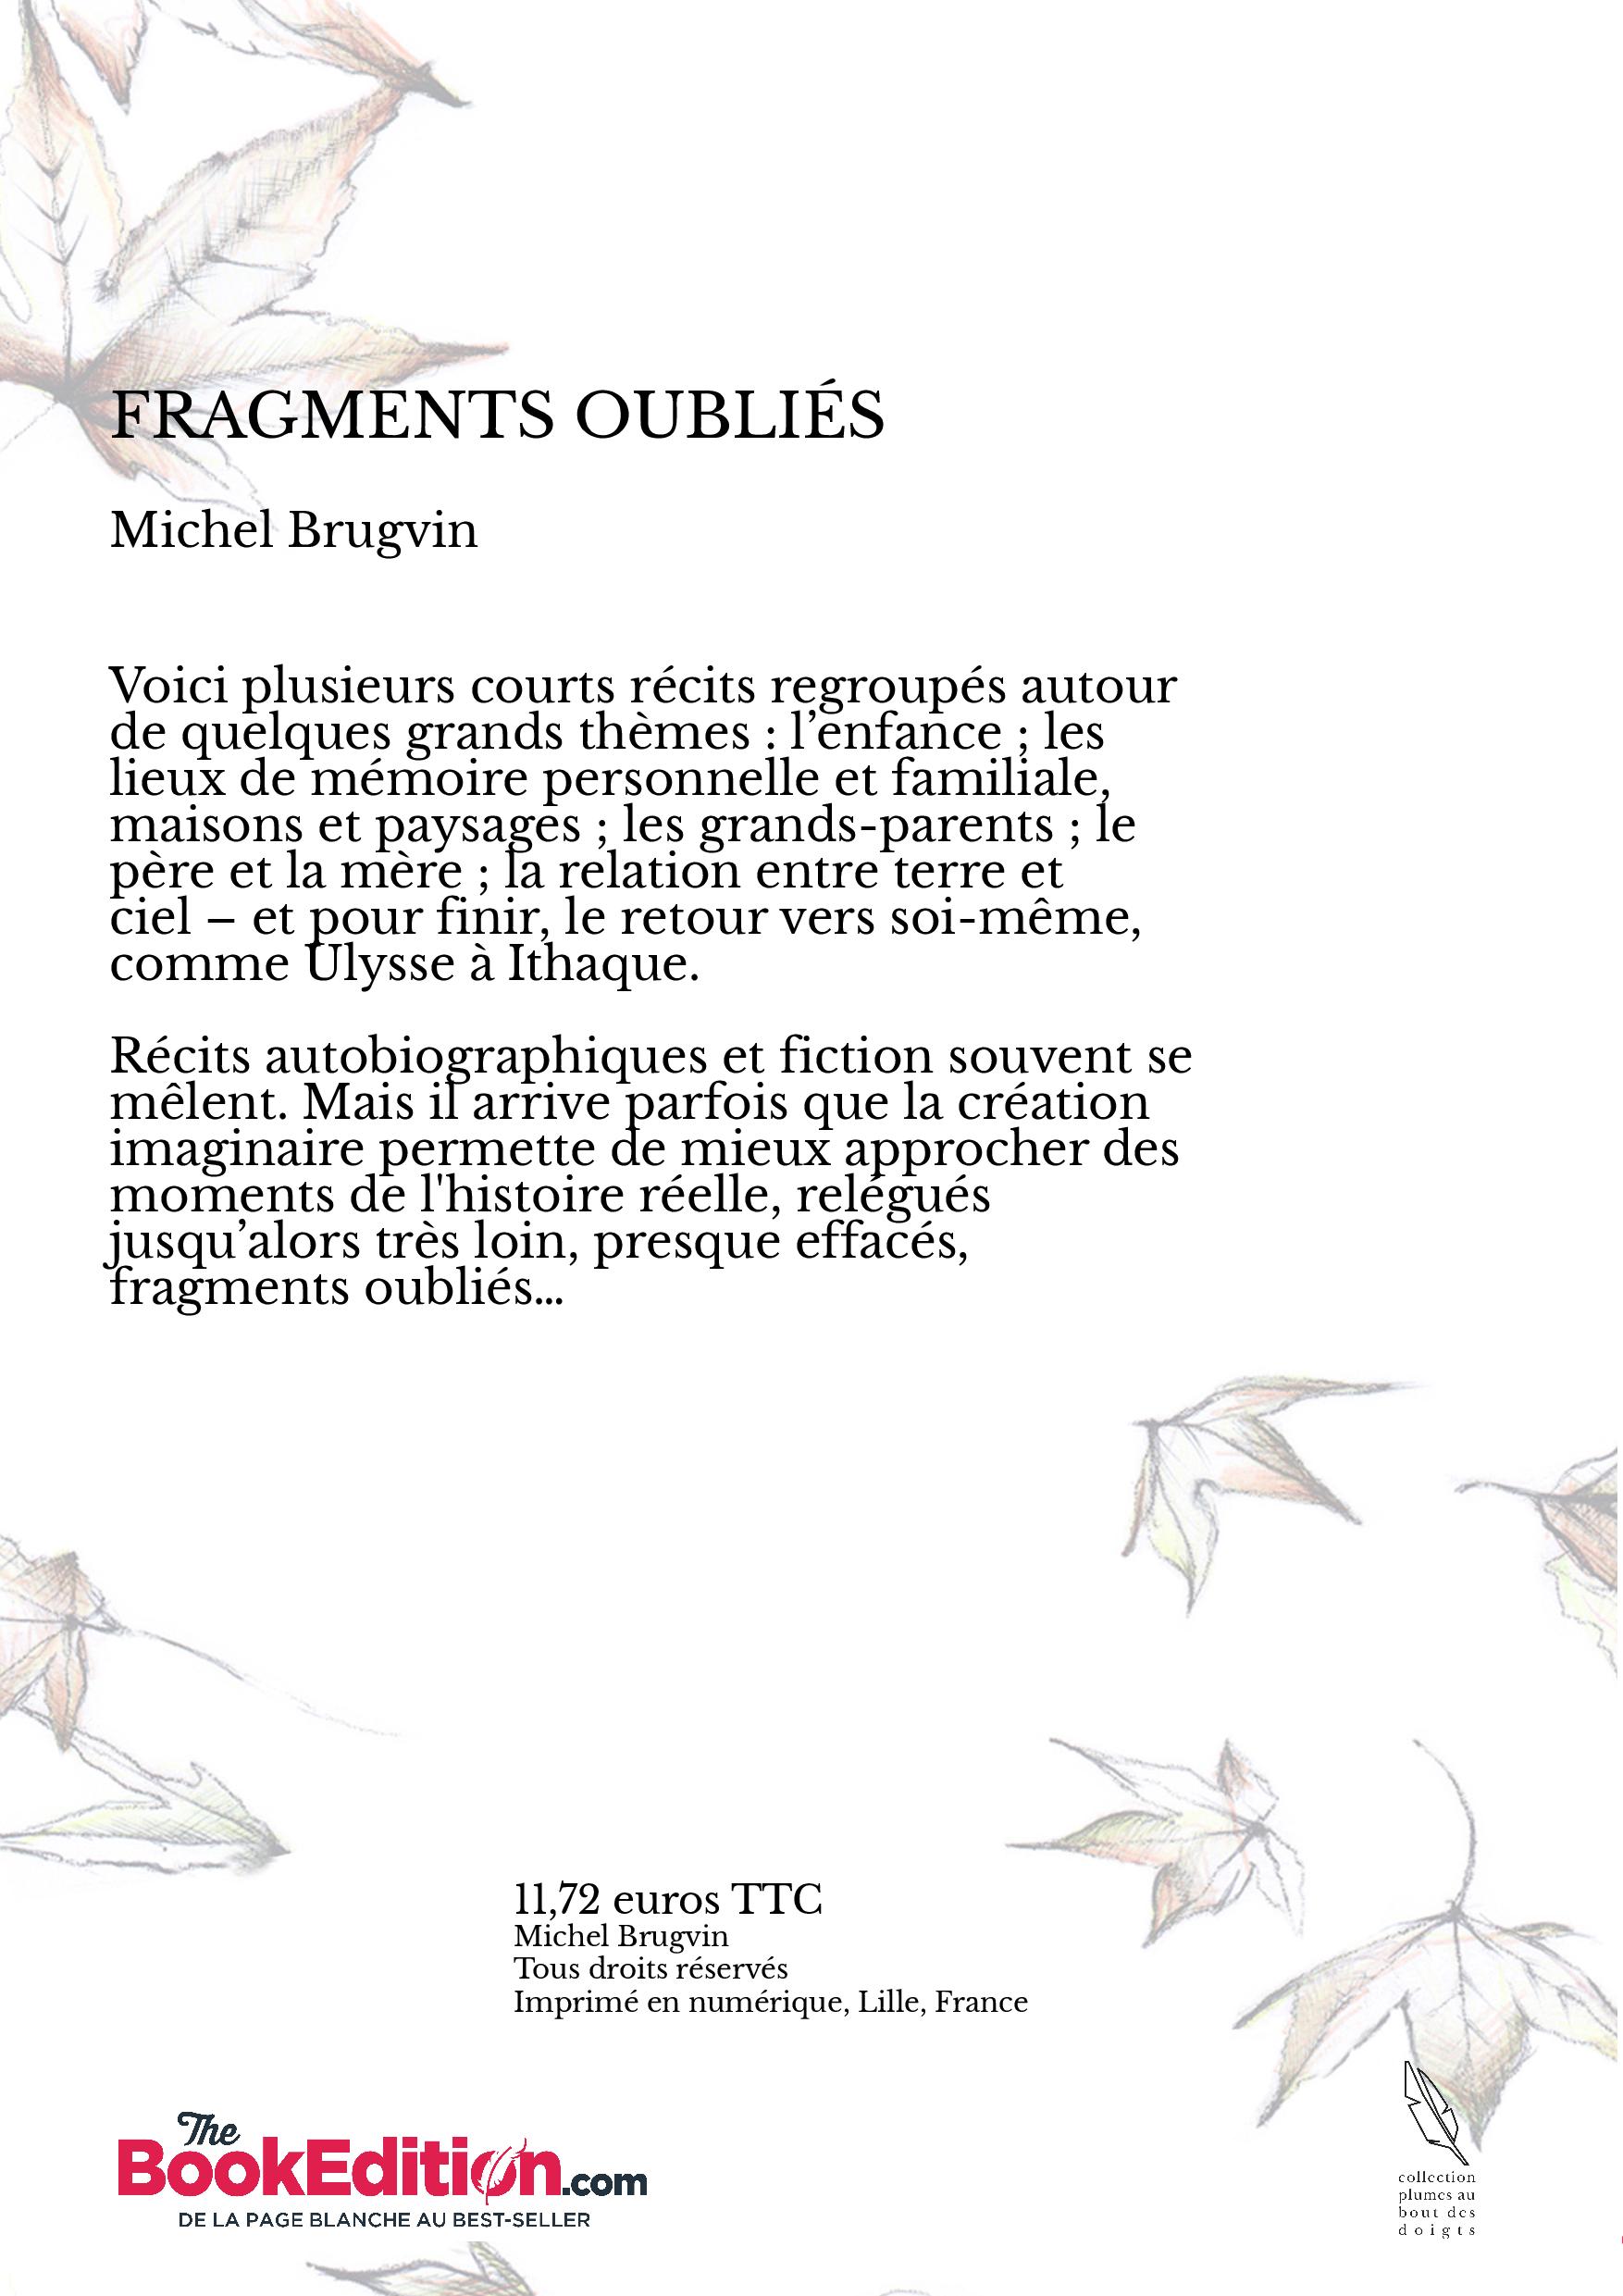 Fragments oubli s michel brugvin - Effroyables jardins michel quint resume complet ...